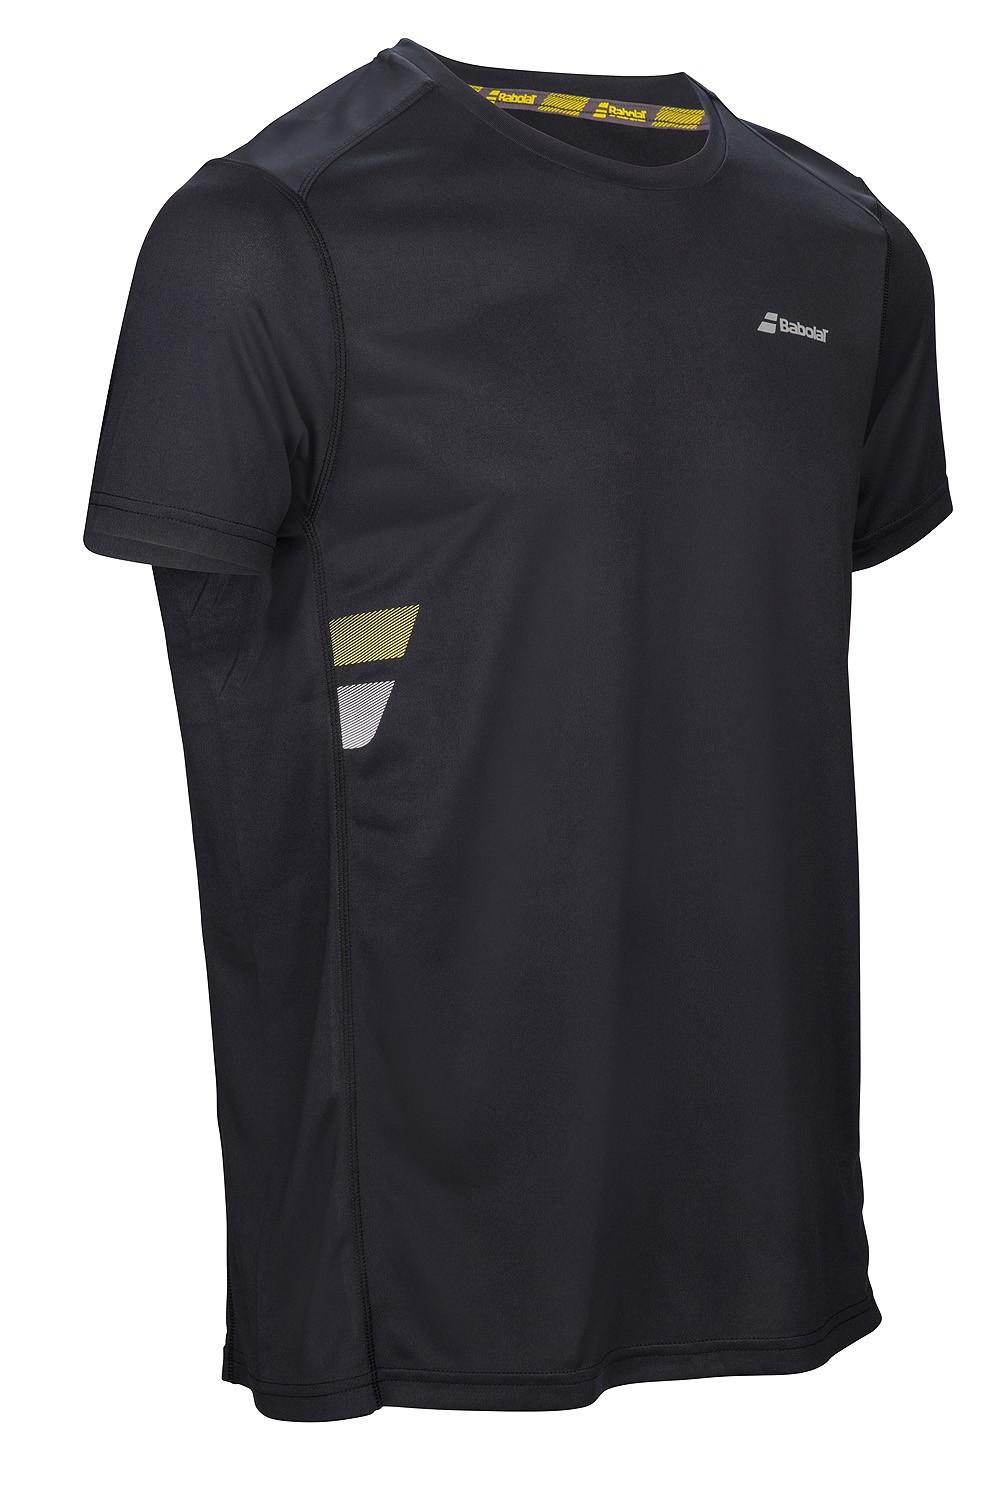 Koszulka tenisowa Babolat Flag Core Tee Black - wyprzedaż!